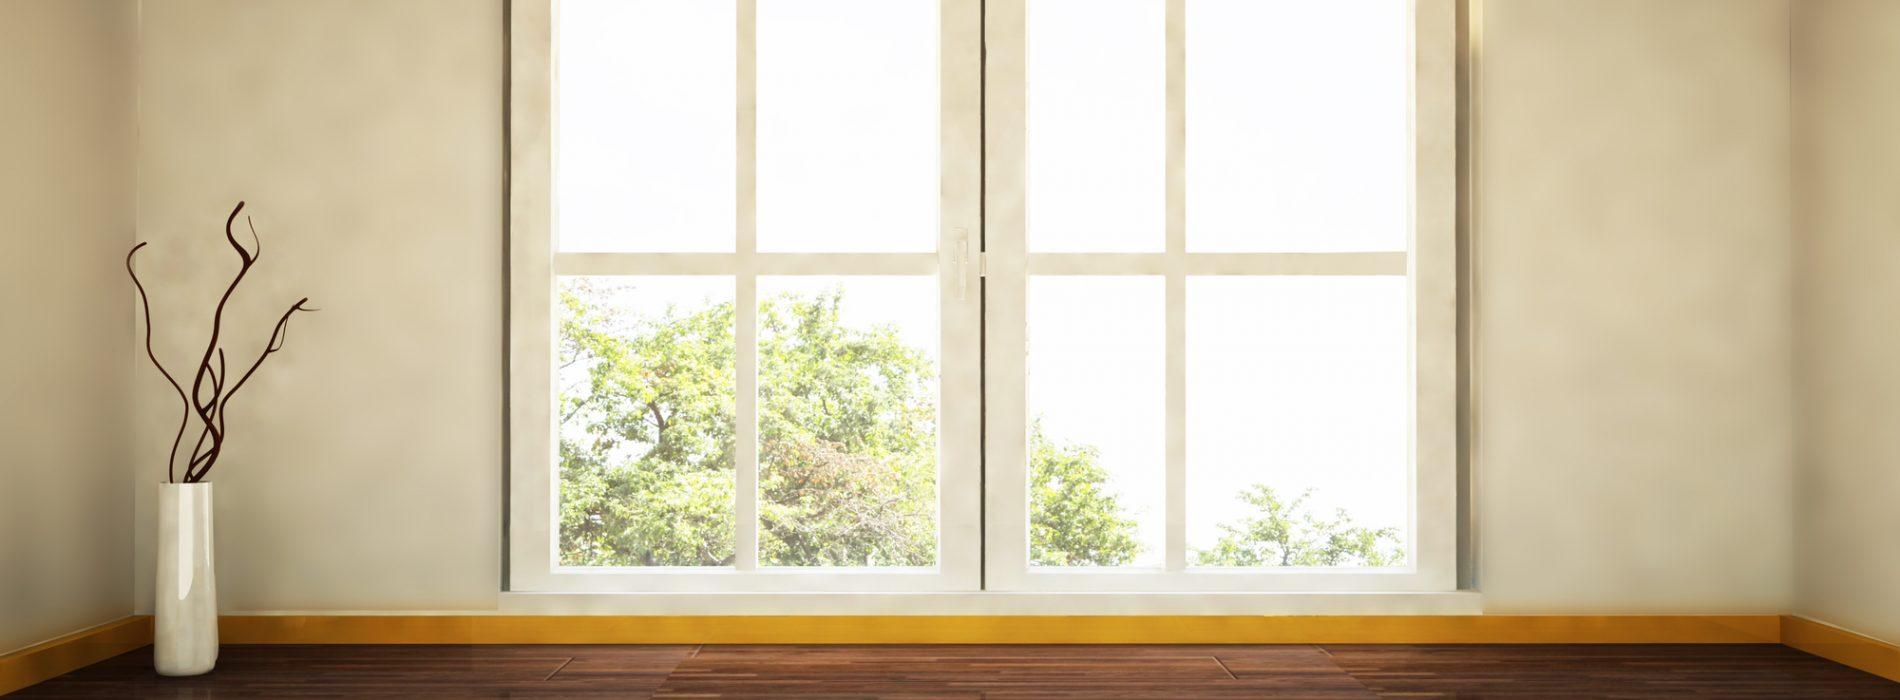 10 Things To Make An Apartment Feel Like Home